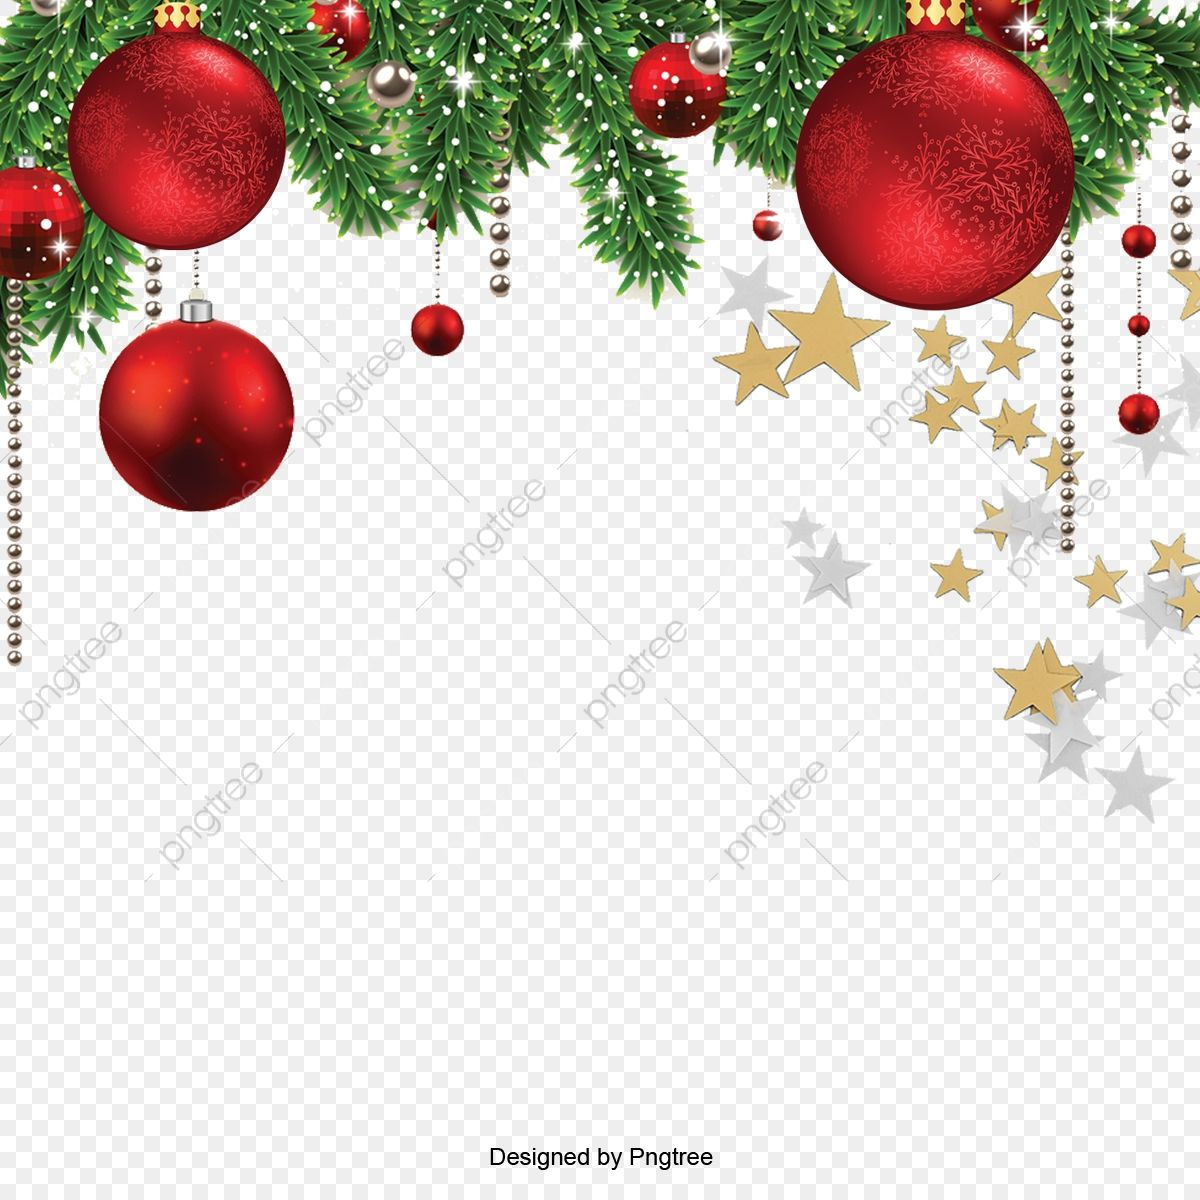 Fresh Display Christmas Decorations Png Gold Christmas Decorations Christmas Stocking Decorations Red Christmas Decor